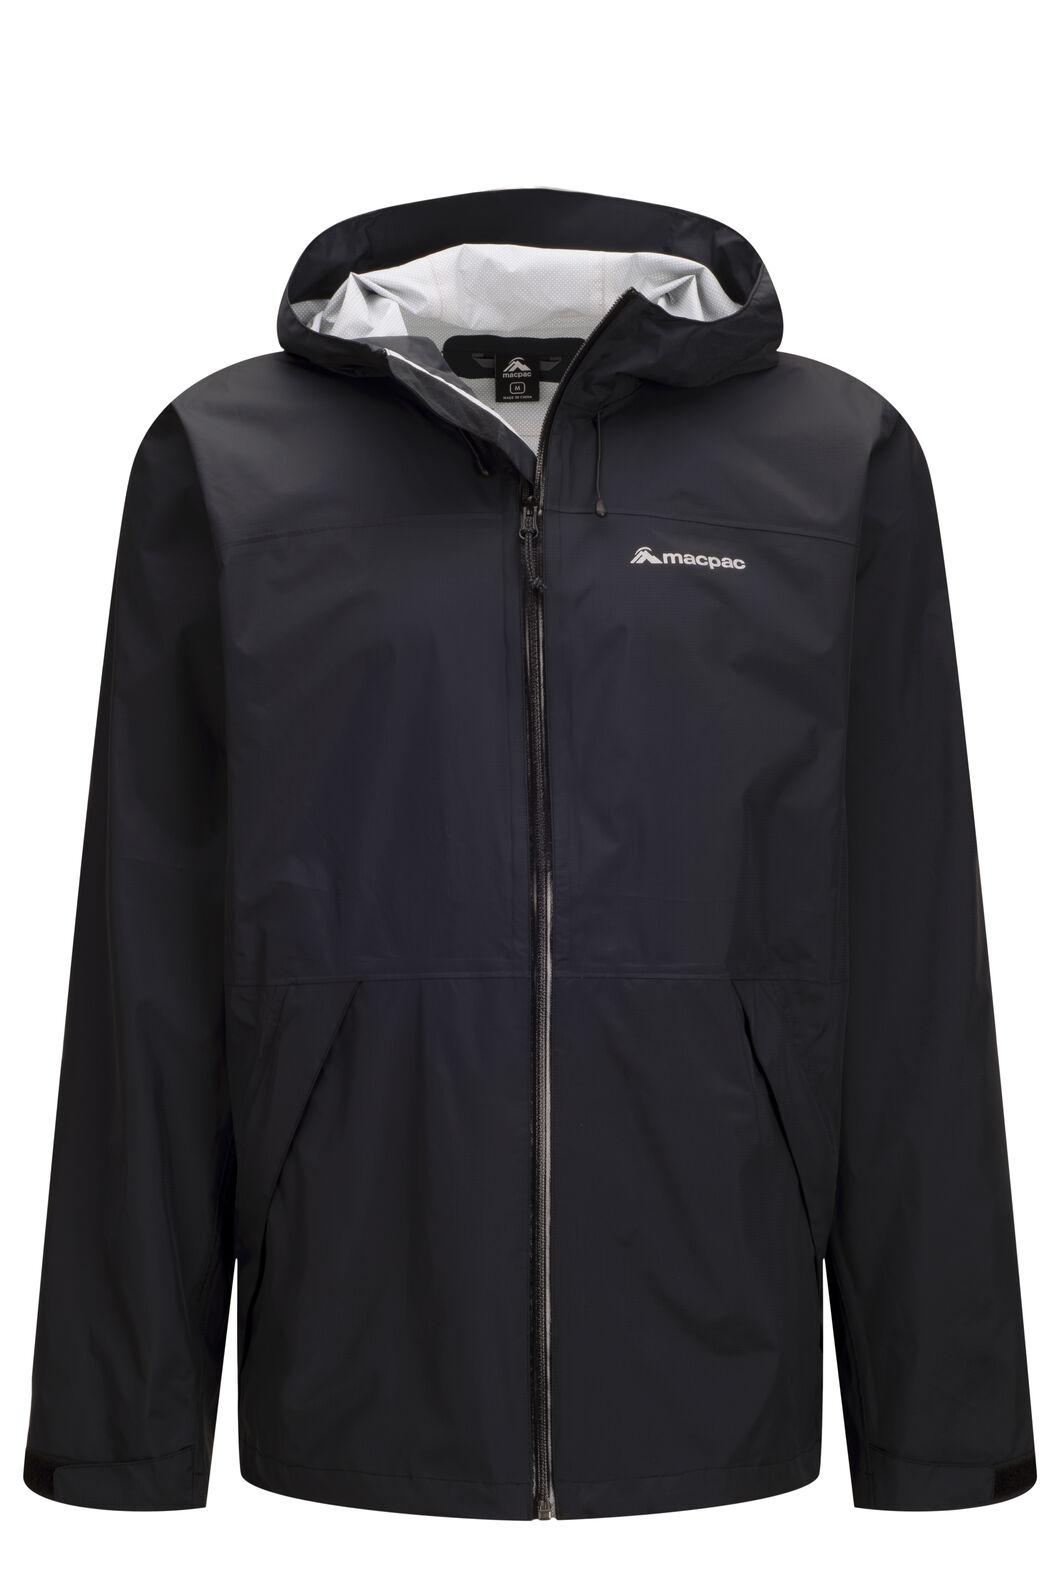 Macpac Men's Mistral Rain Jacket, Black, hi-res